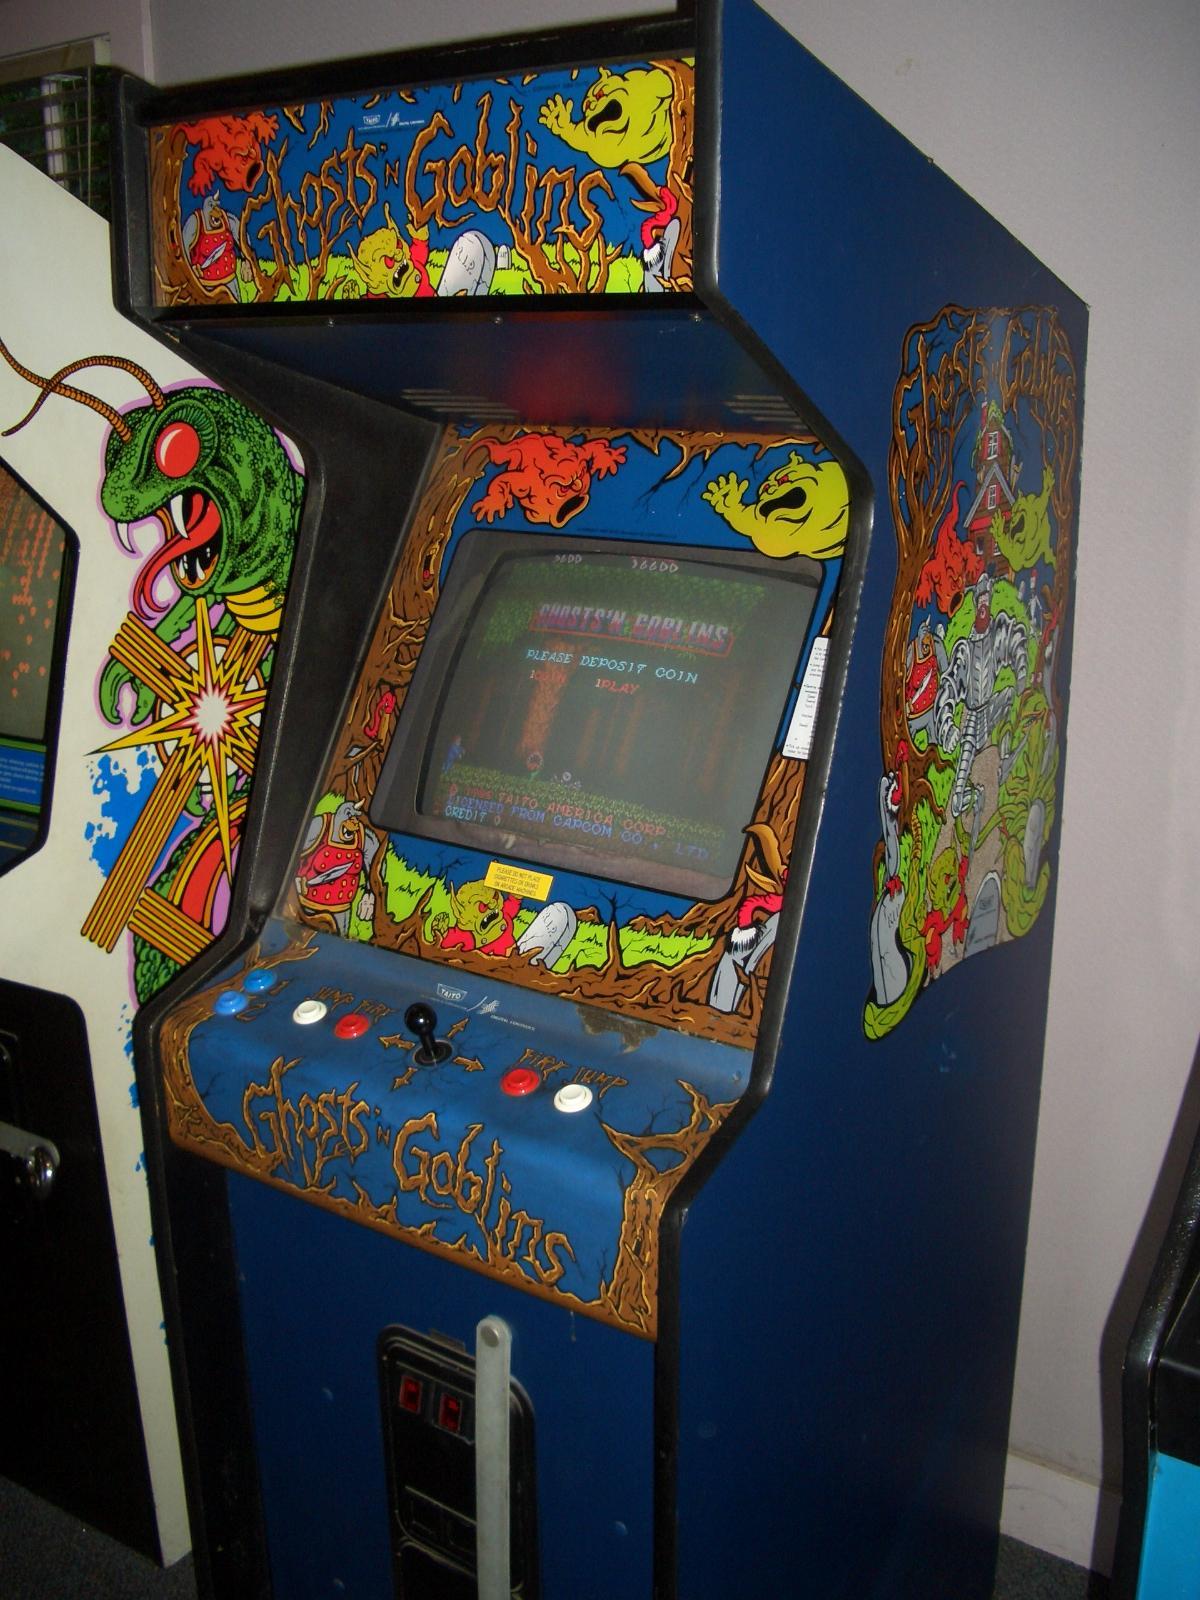 Fishsta S Retro Zone Arcade Ghosts N Goblins